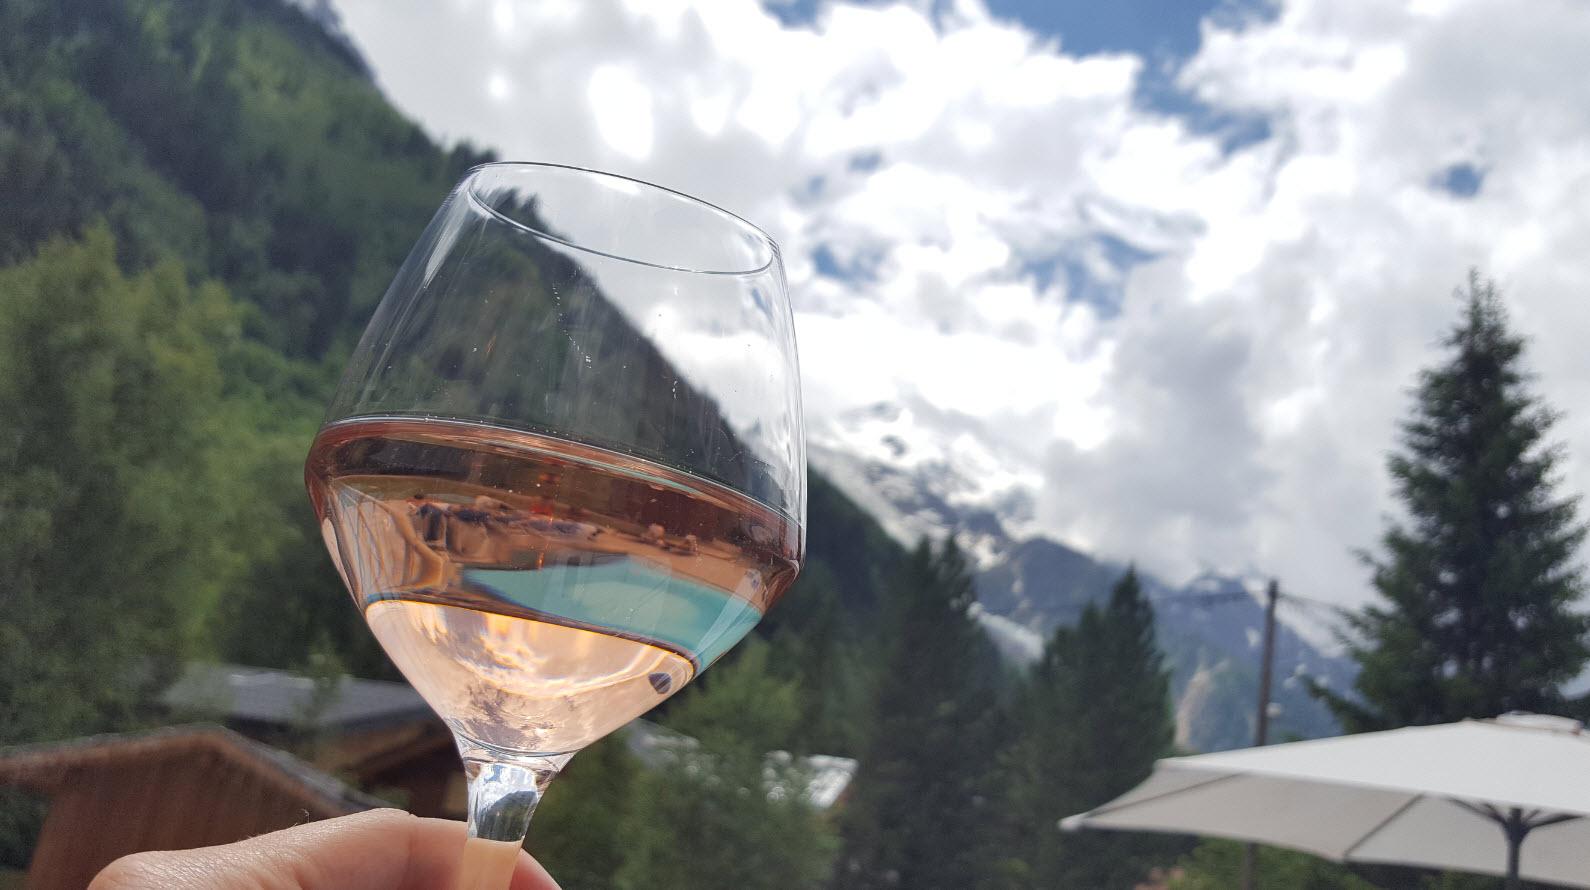 Enjoy the wine...